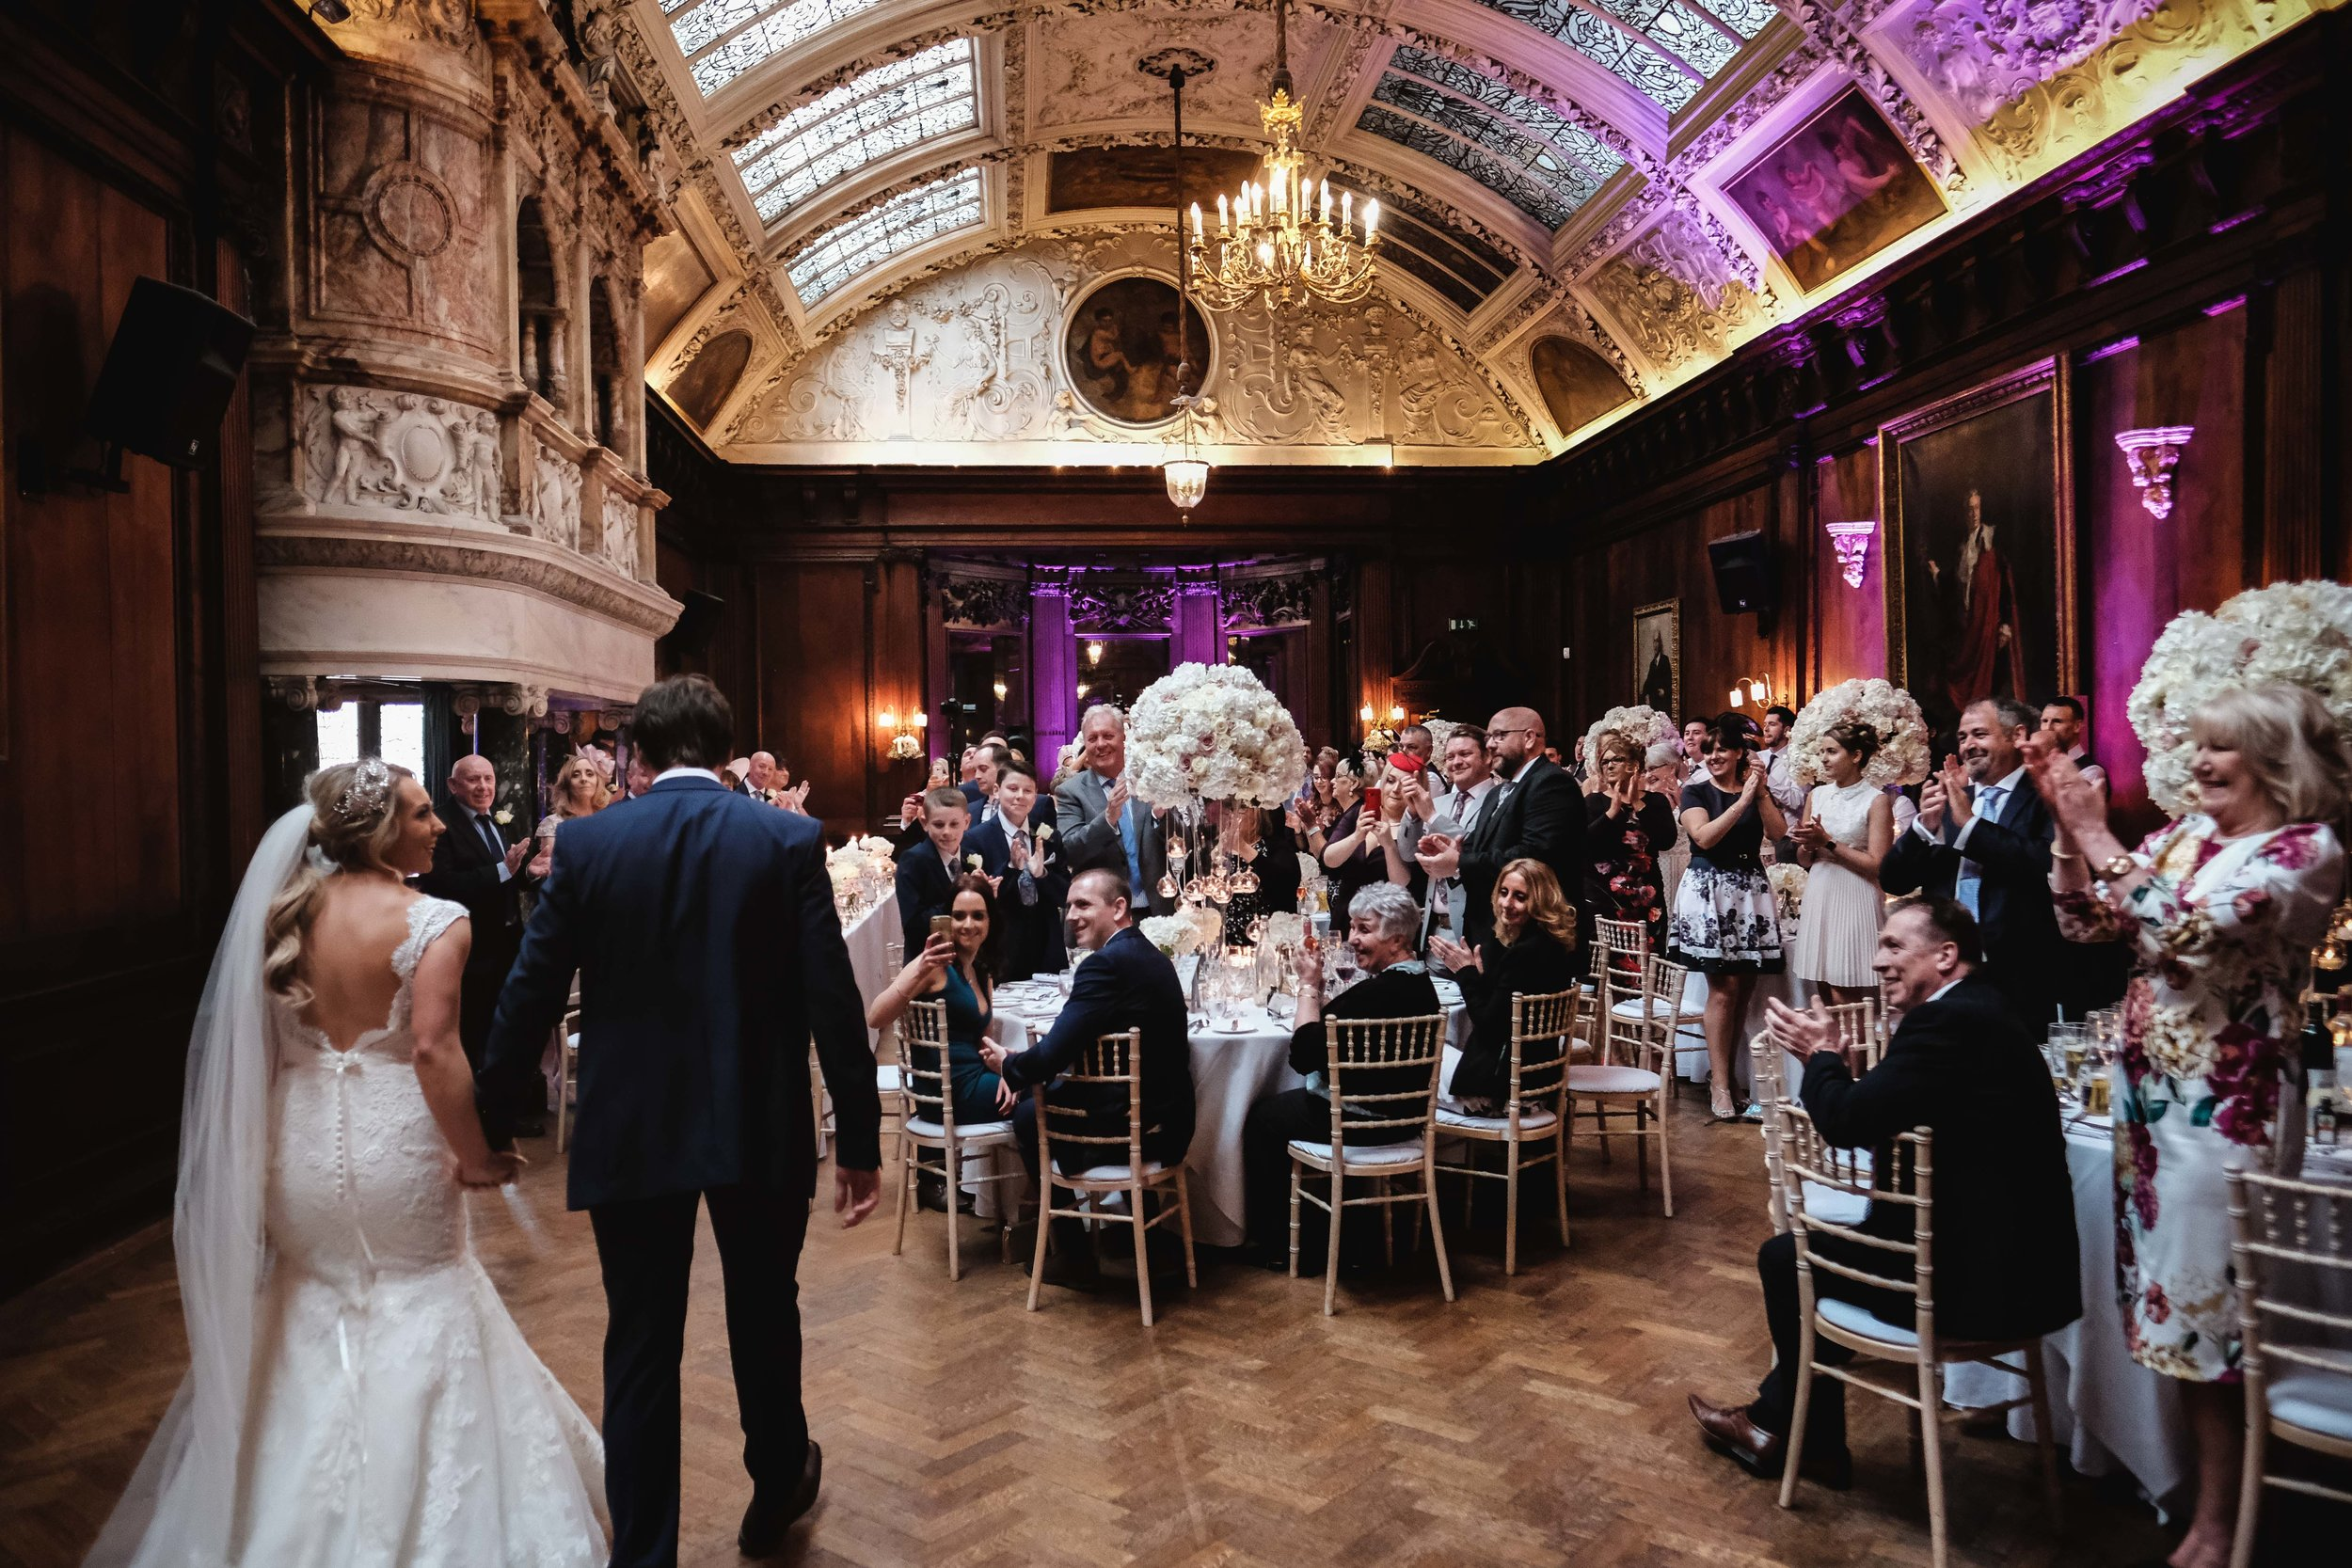 Thornton manor wedding photography cheshire wedding photographer liverpool manchester warrington chester wirral wedding BLOG (62 of 108).jpg